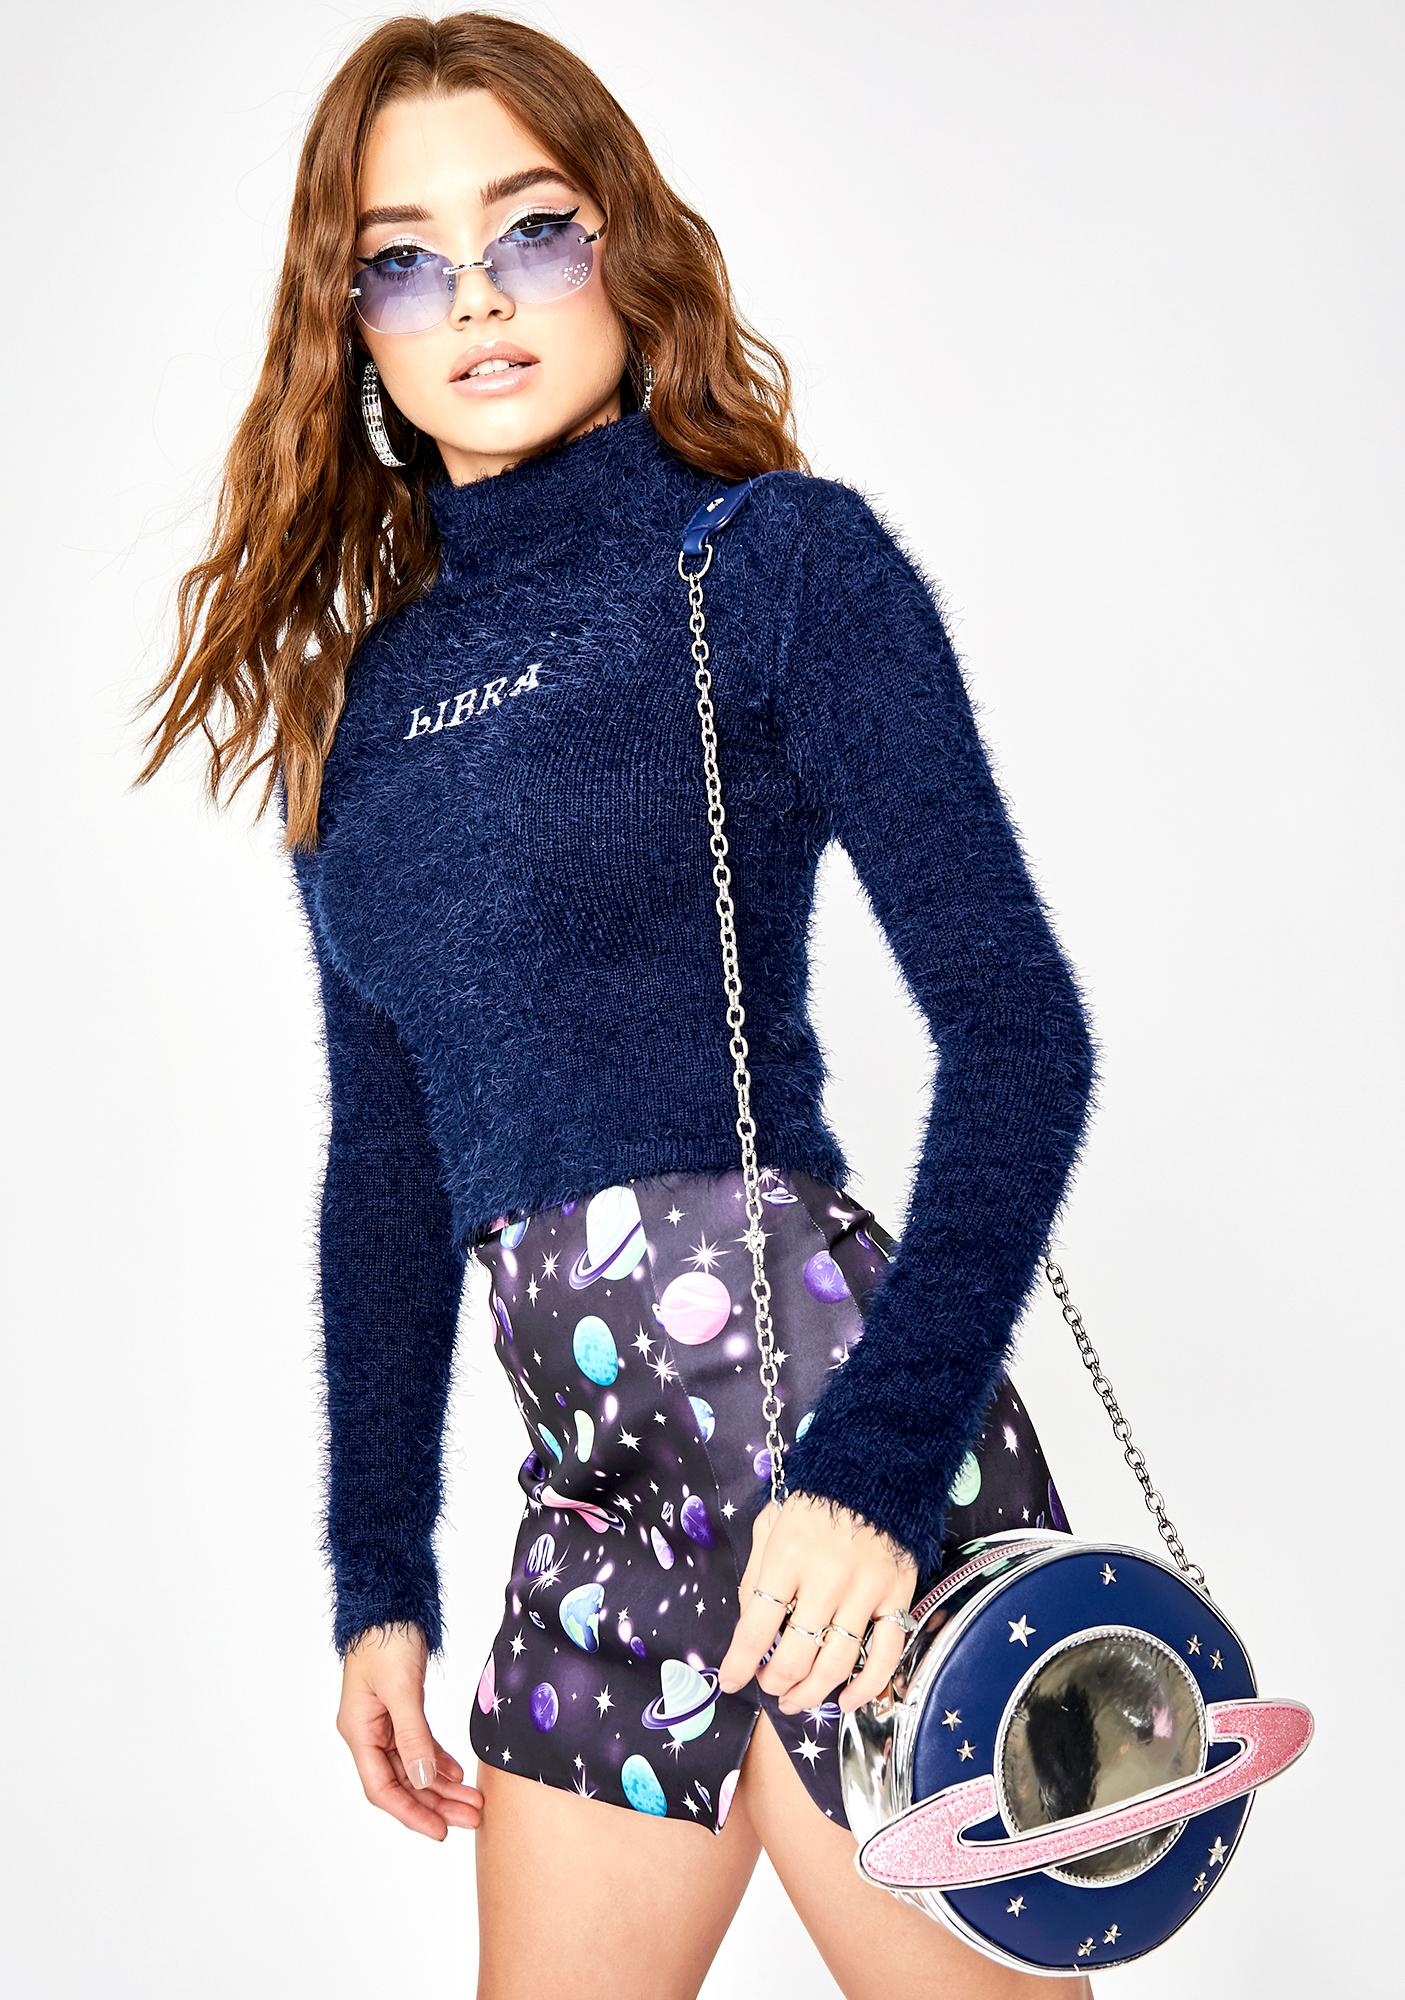 HOROSCOPEZ Loyal Libra Fuzzy Sweater